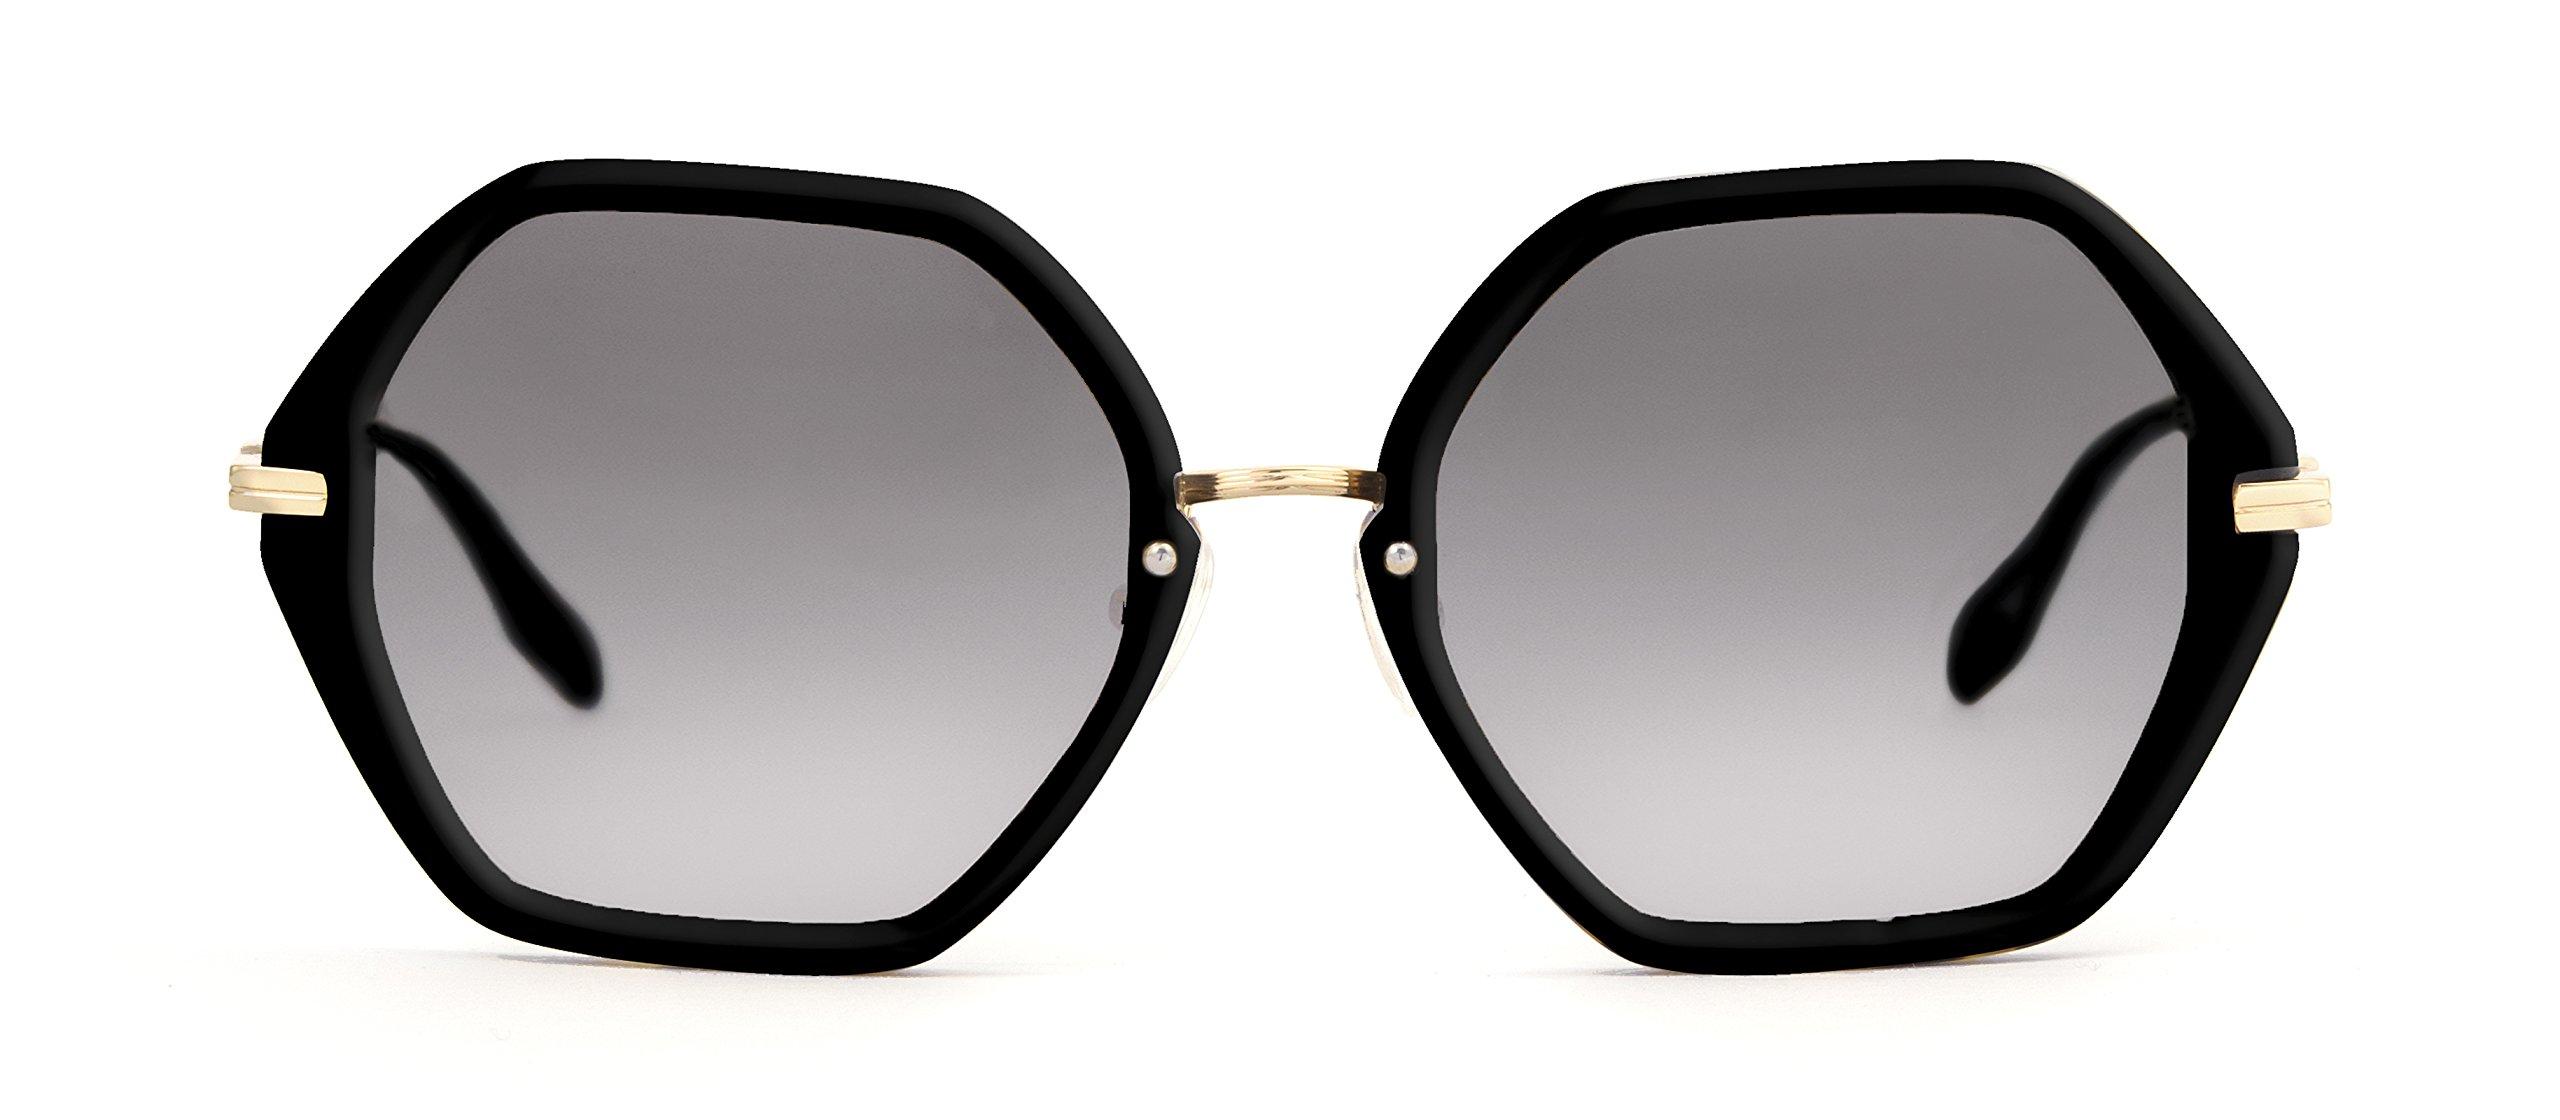 Sonix Women's Willow Sunglasses, Black/Black Fade, One Size